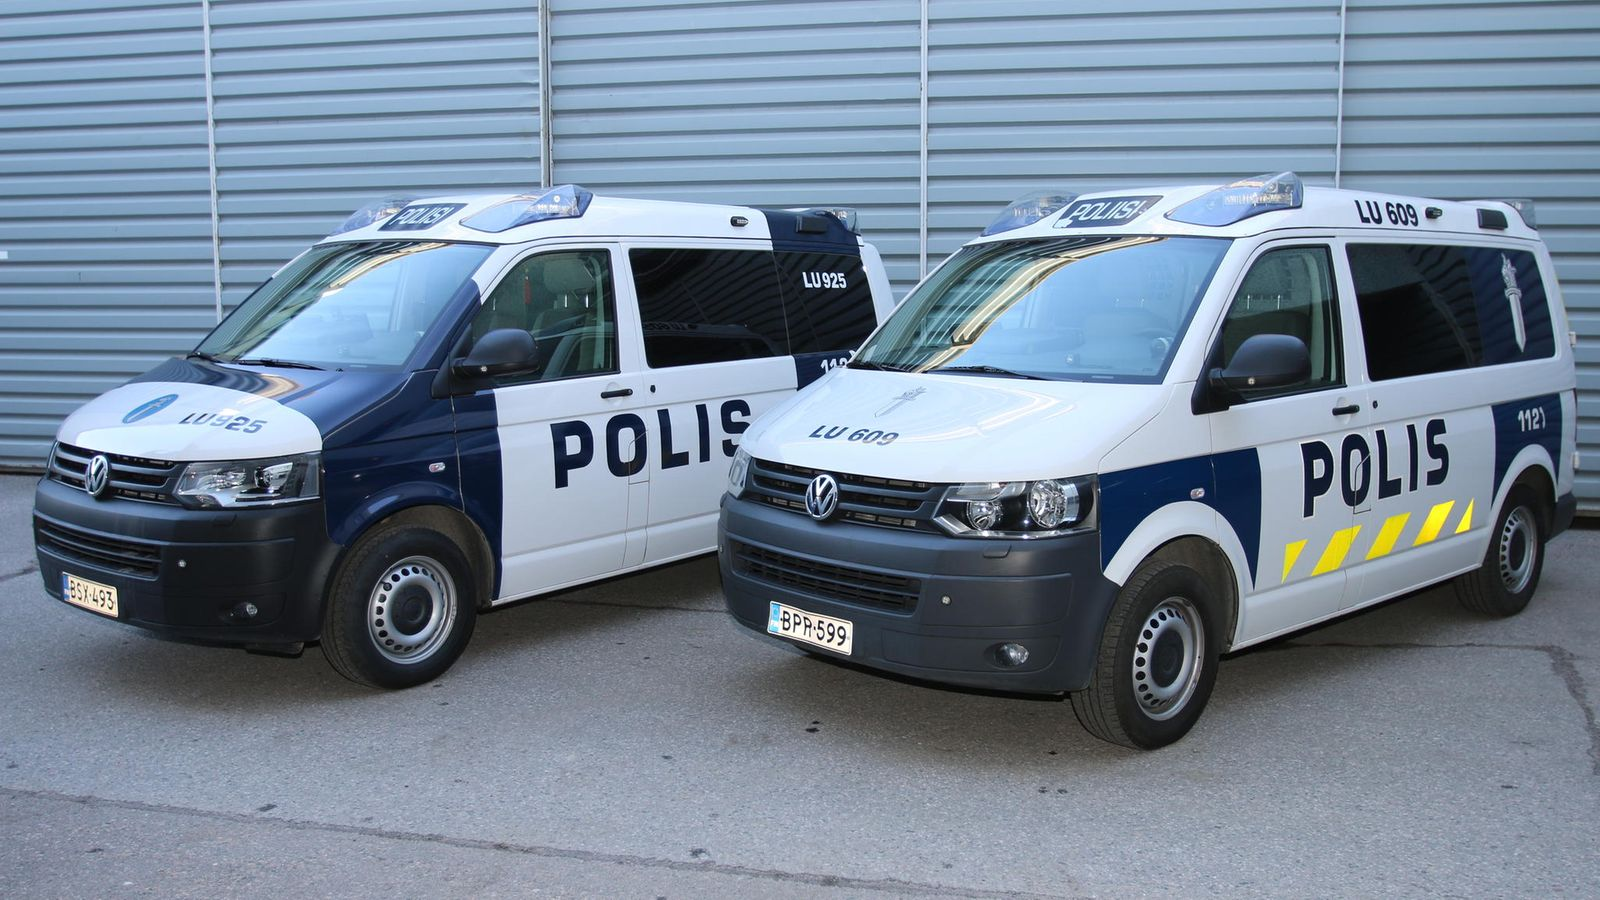 Poliisin Ajoneuvot